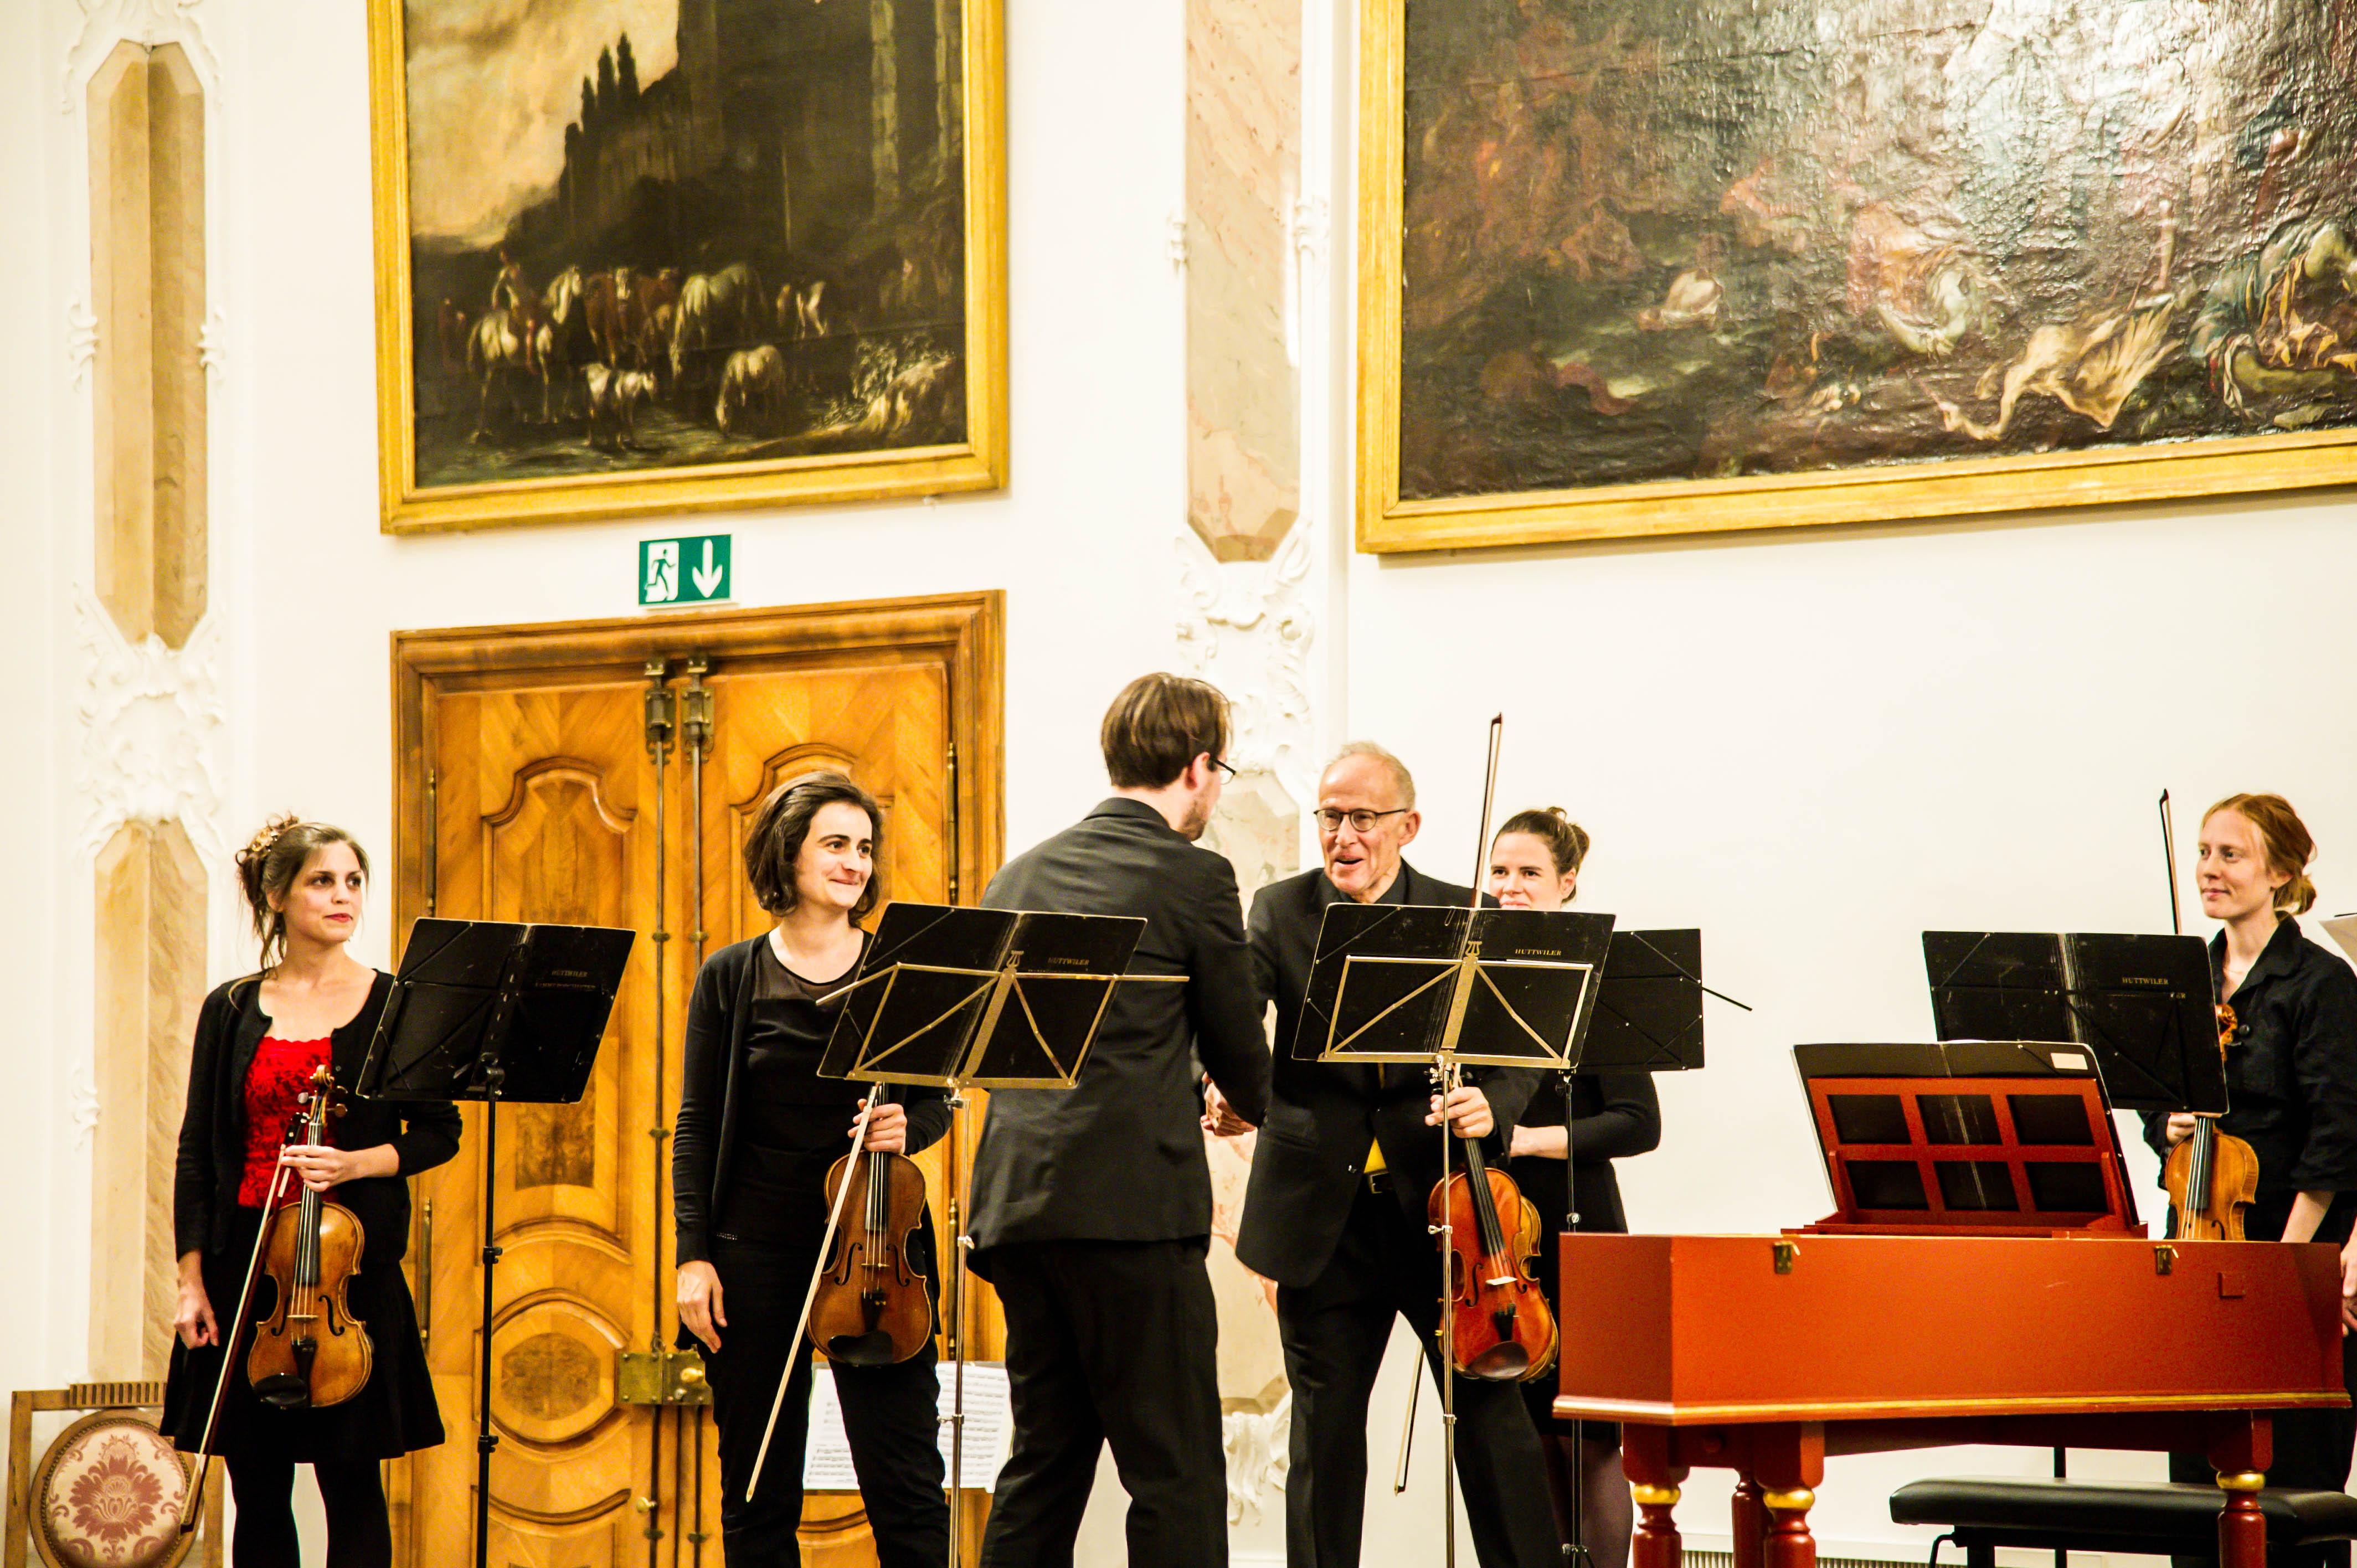 17_09_Herbstkonzert Kammerorchester Huttwil_BO-64